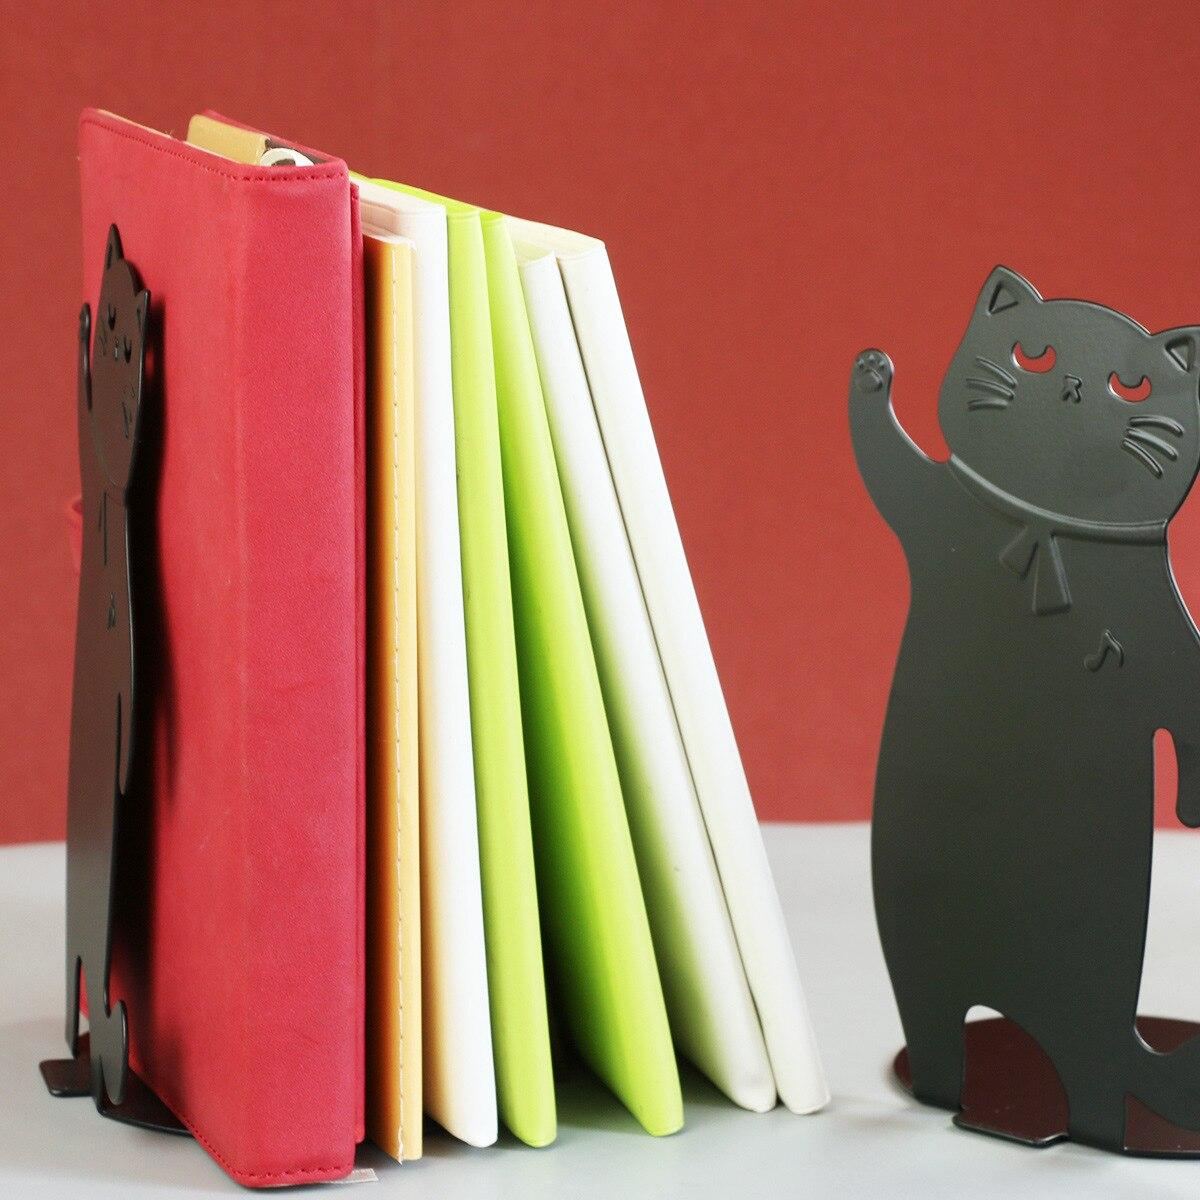 2pcs/pair Metal Desktop Organizer Bookends Animal Cat Shape Desk Holder Stand for Books Organizer Gift Stationery